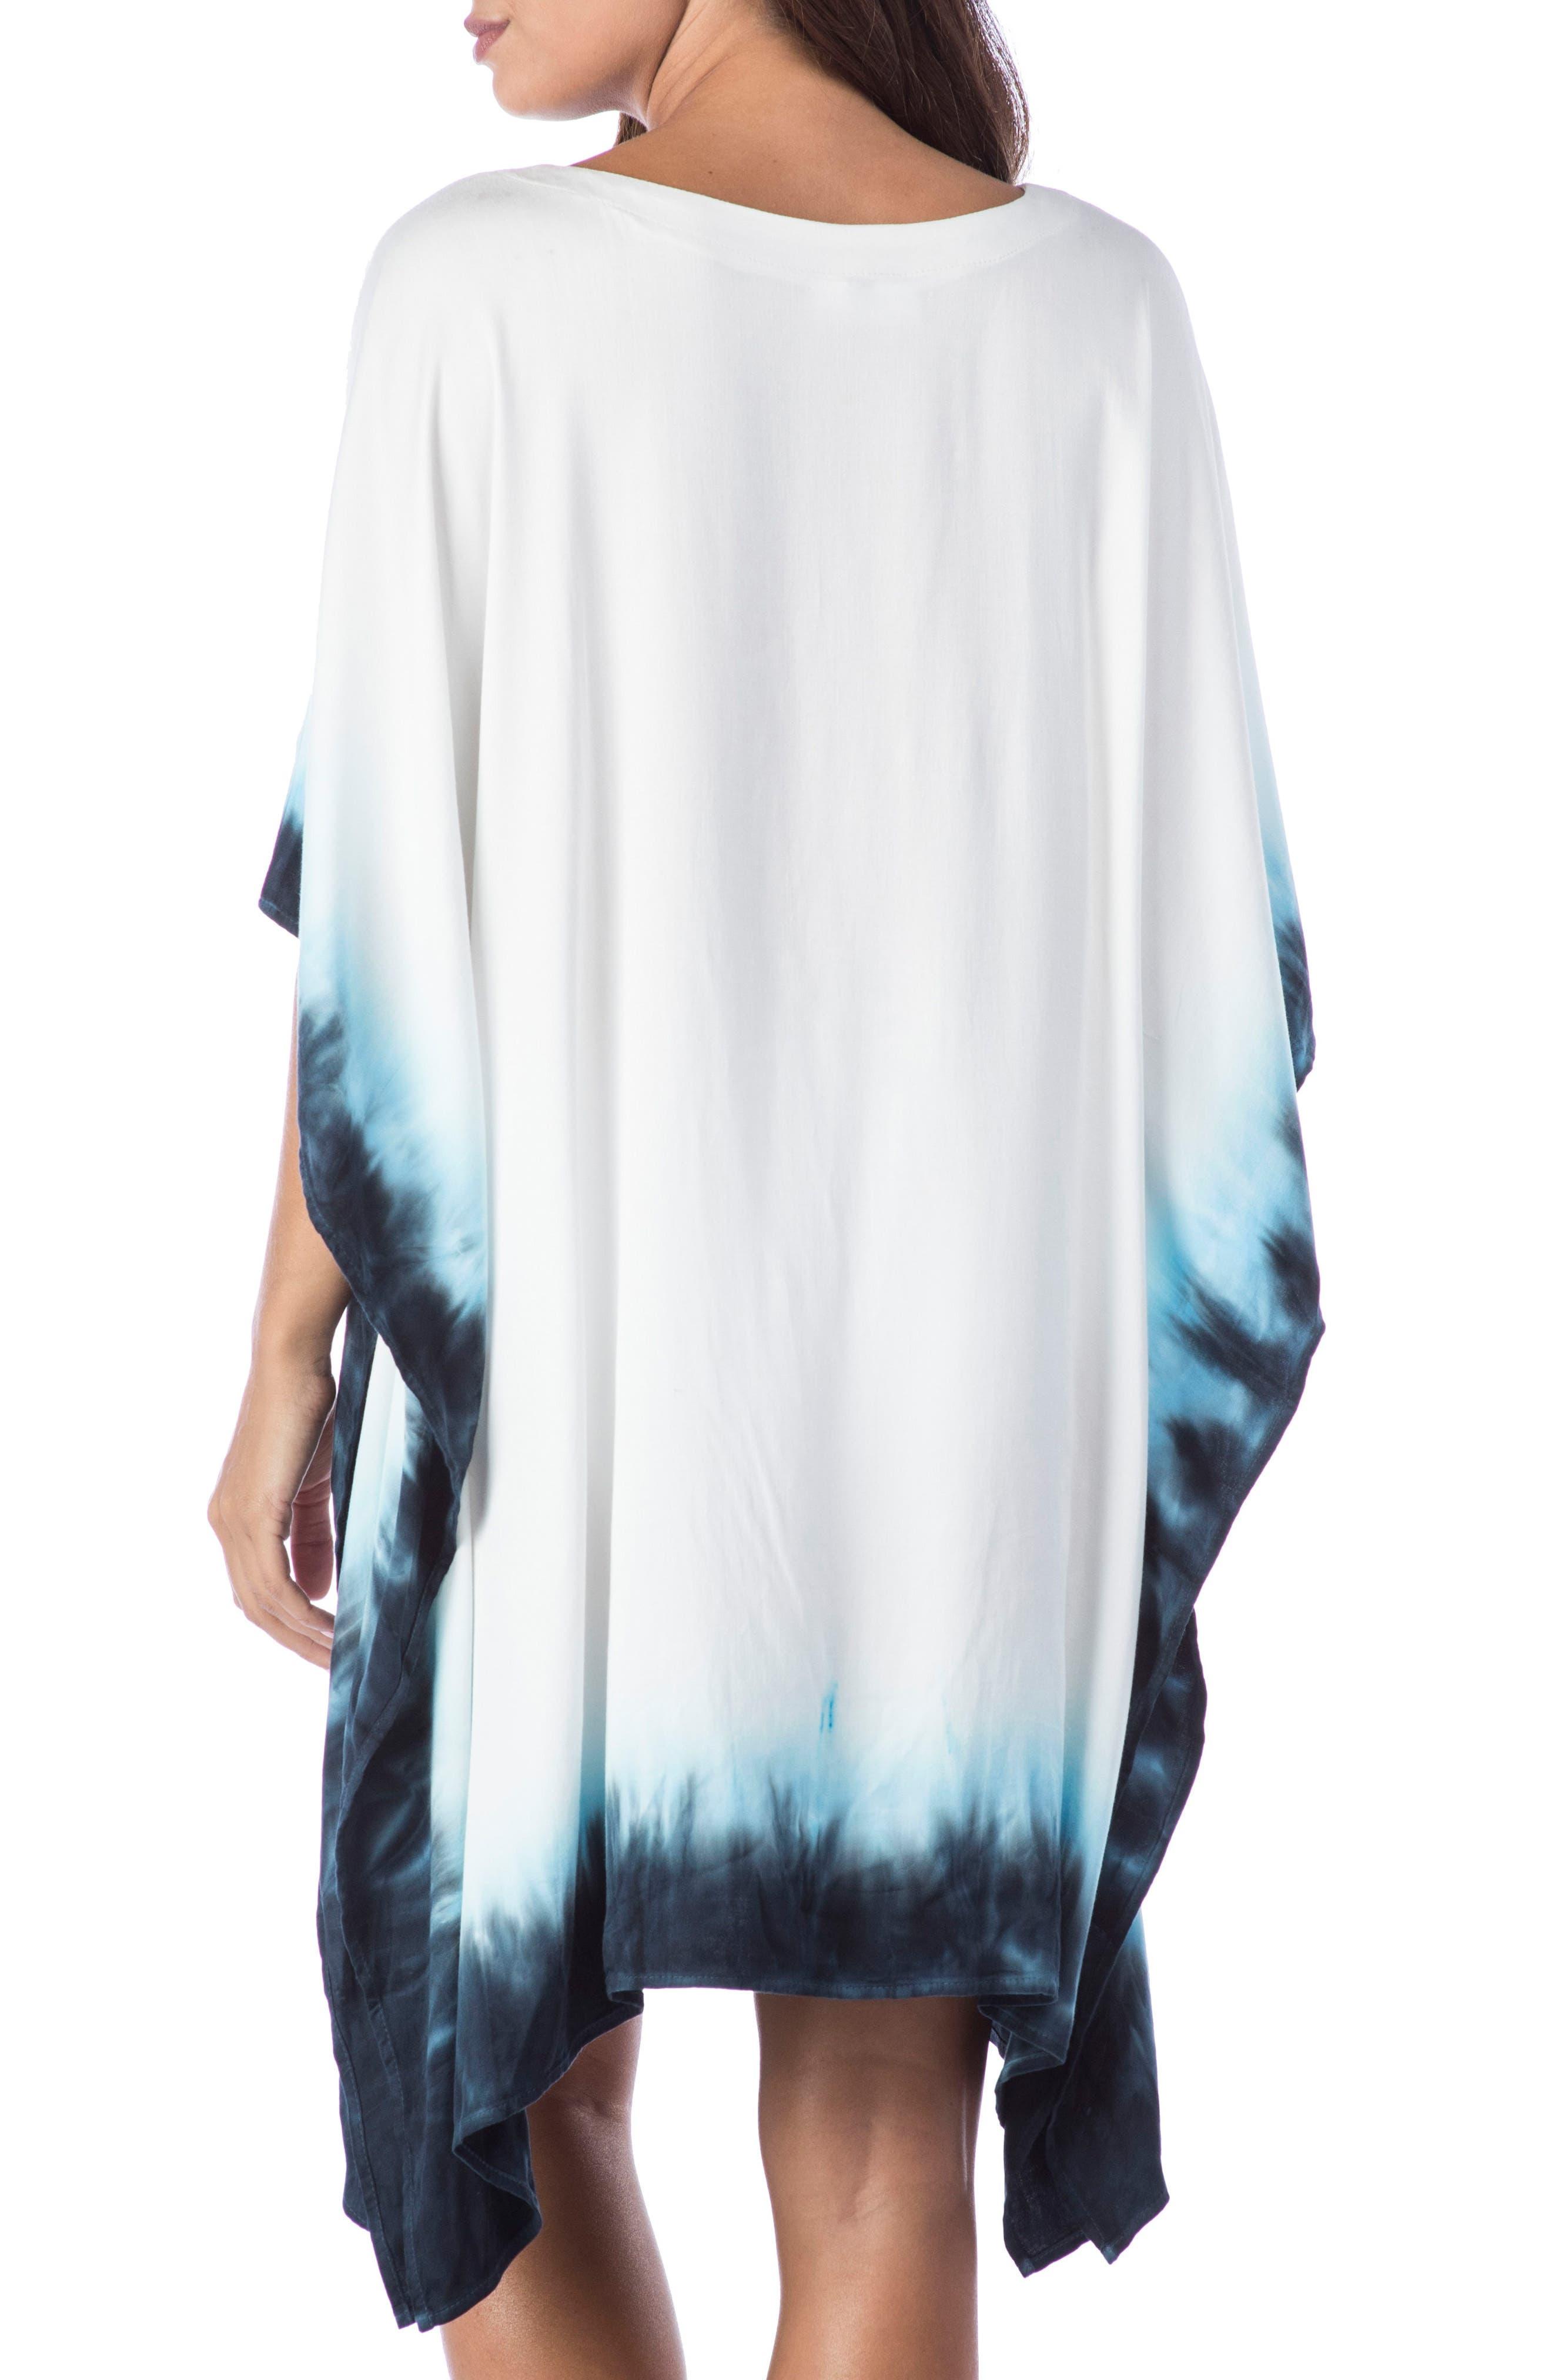 St. Tropez Lace-Up Cover-Up Tunic,                             Alternate thumbnail 2, color,                             Blue